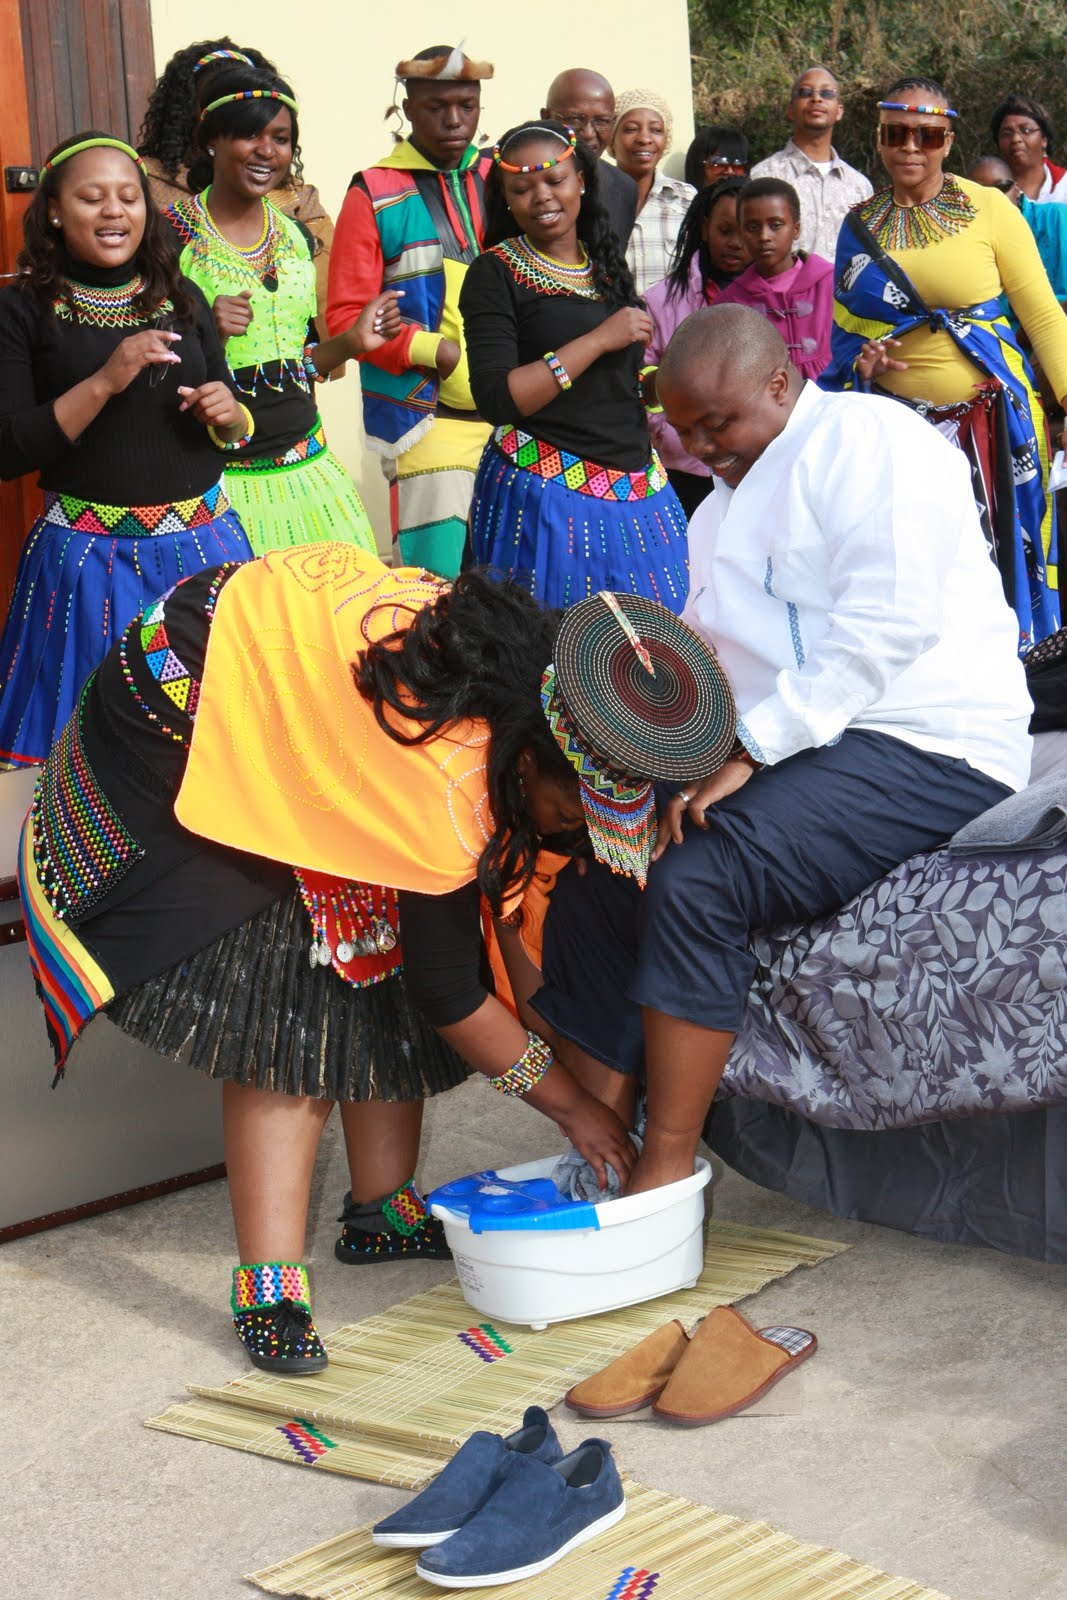 Washing his fee... Feet Washing At Wedding